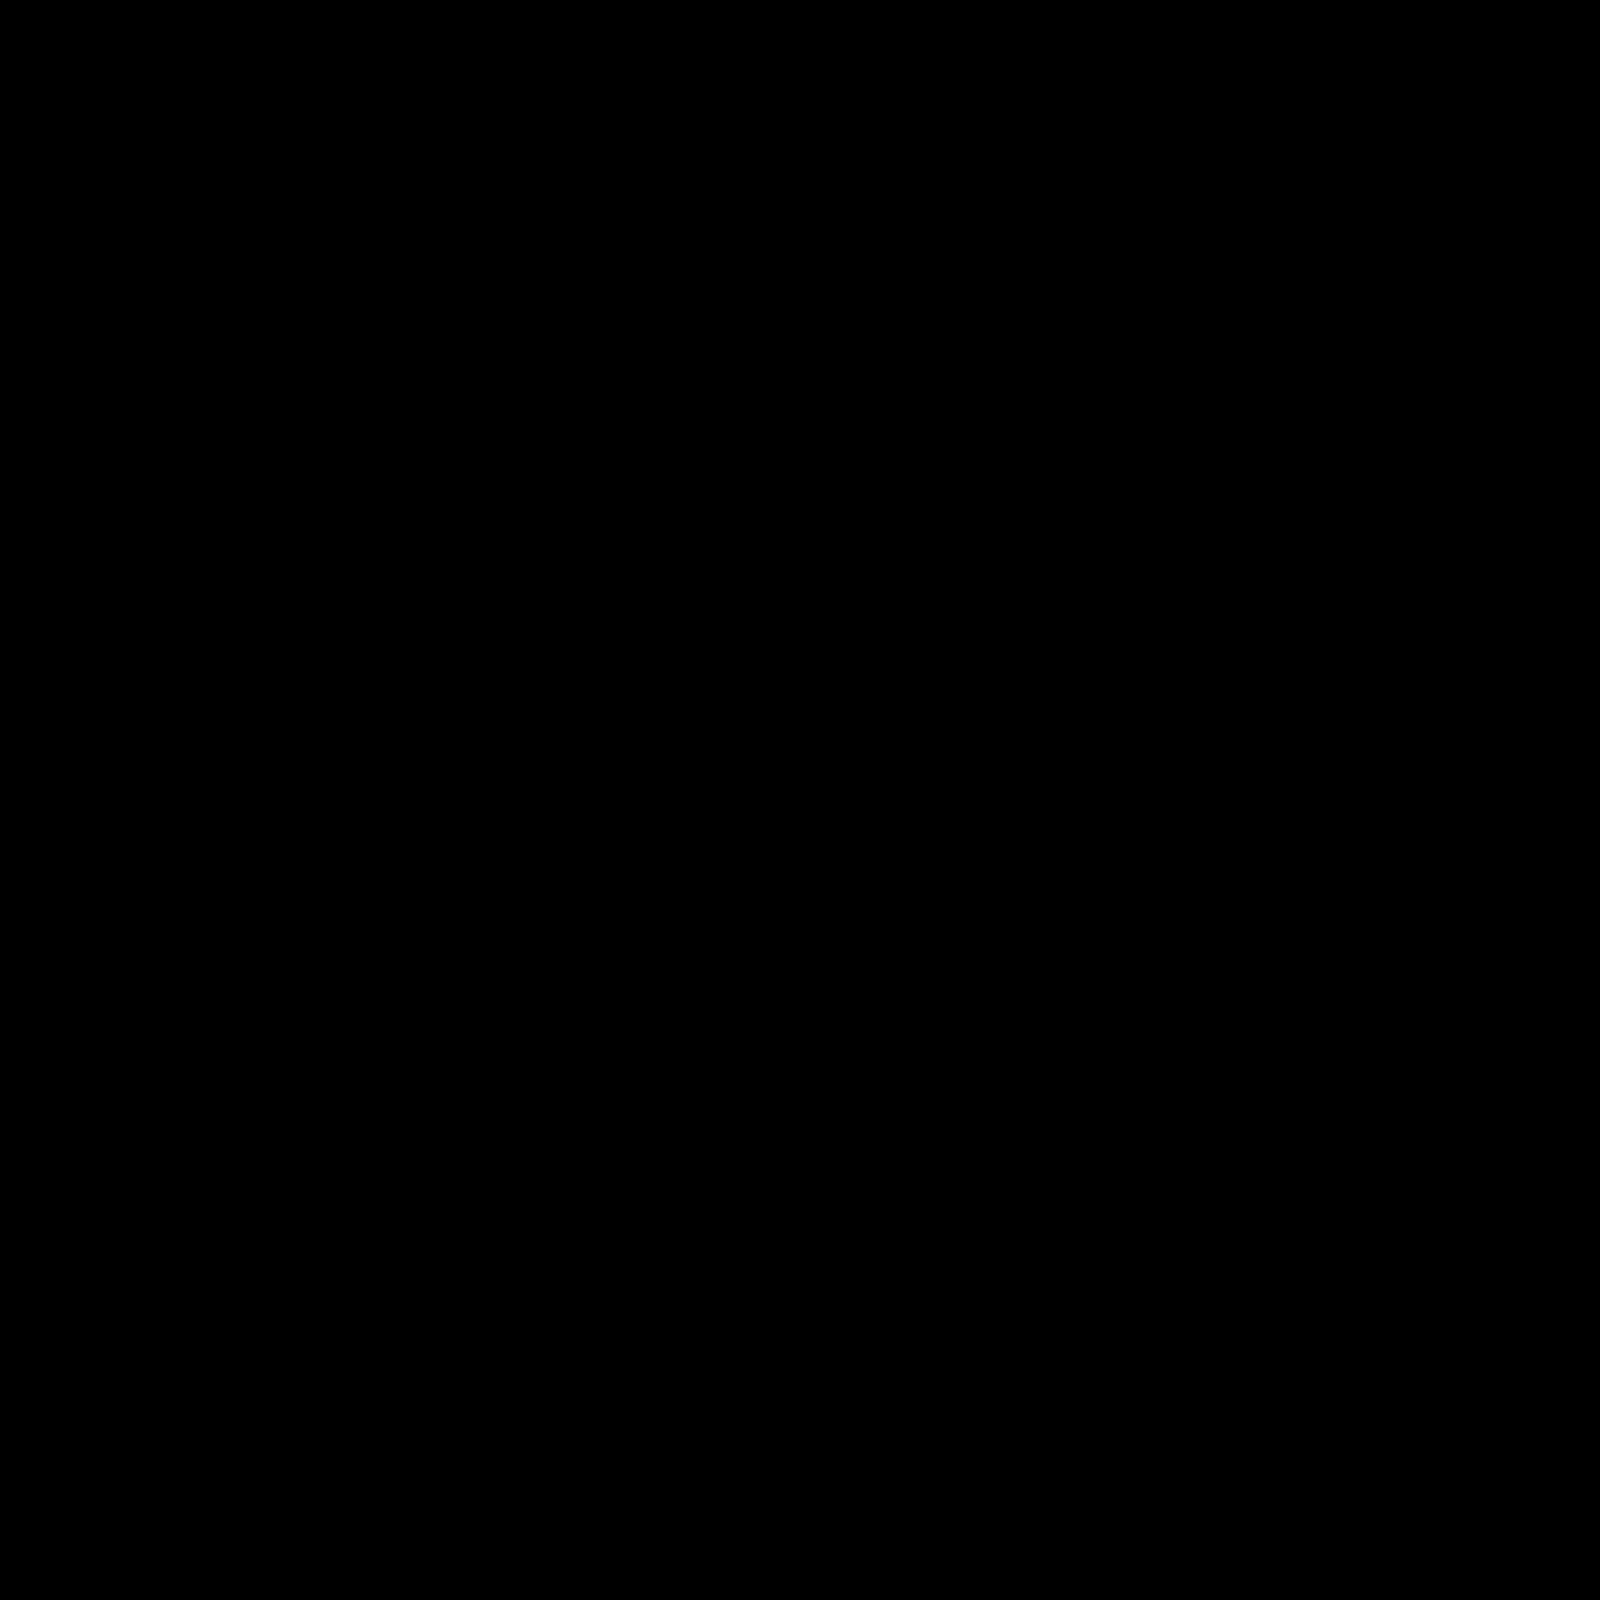 Linking icon